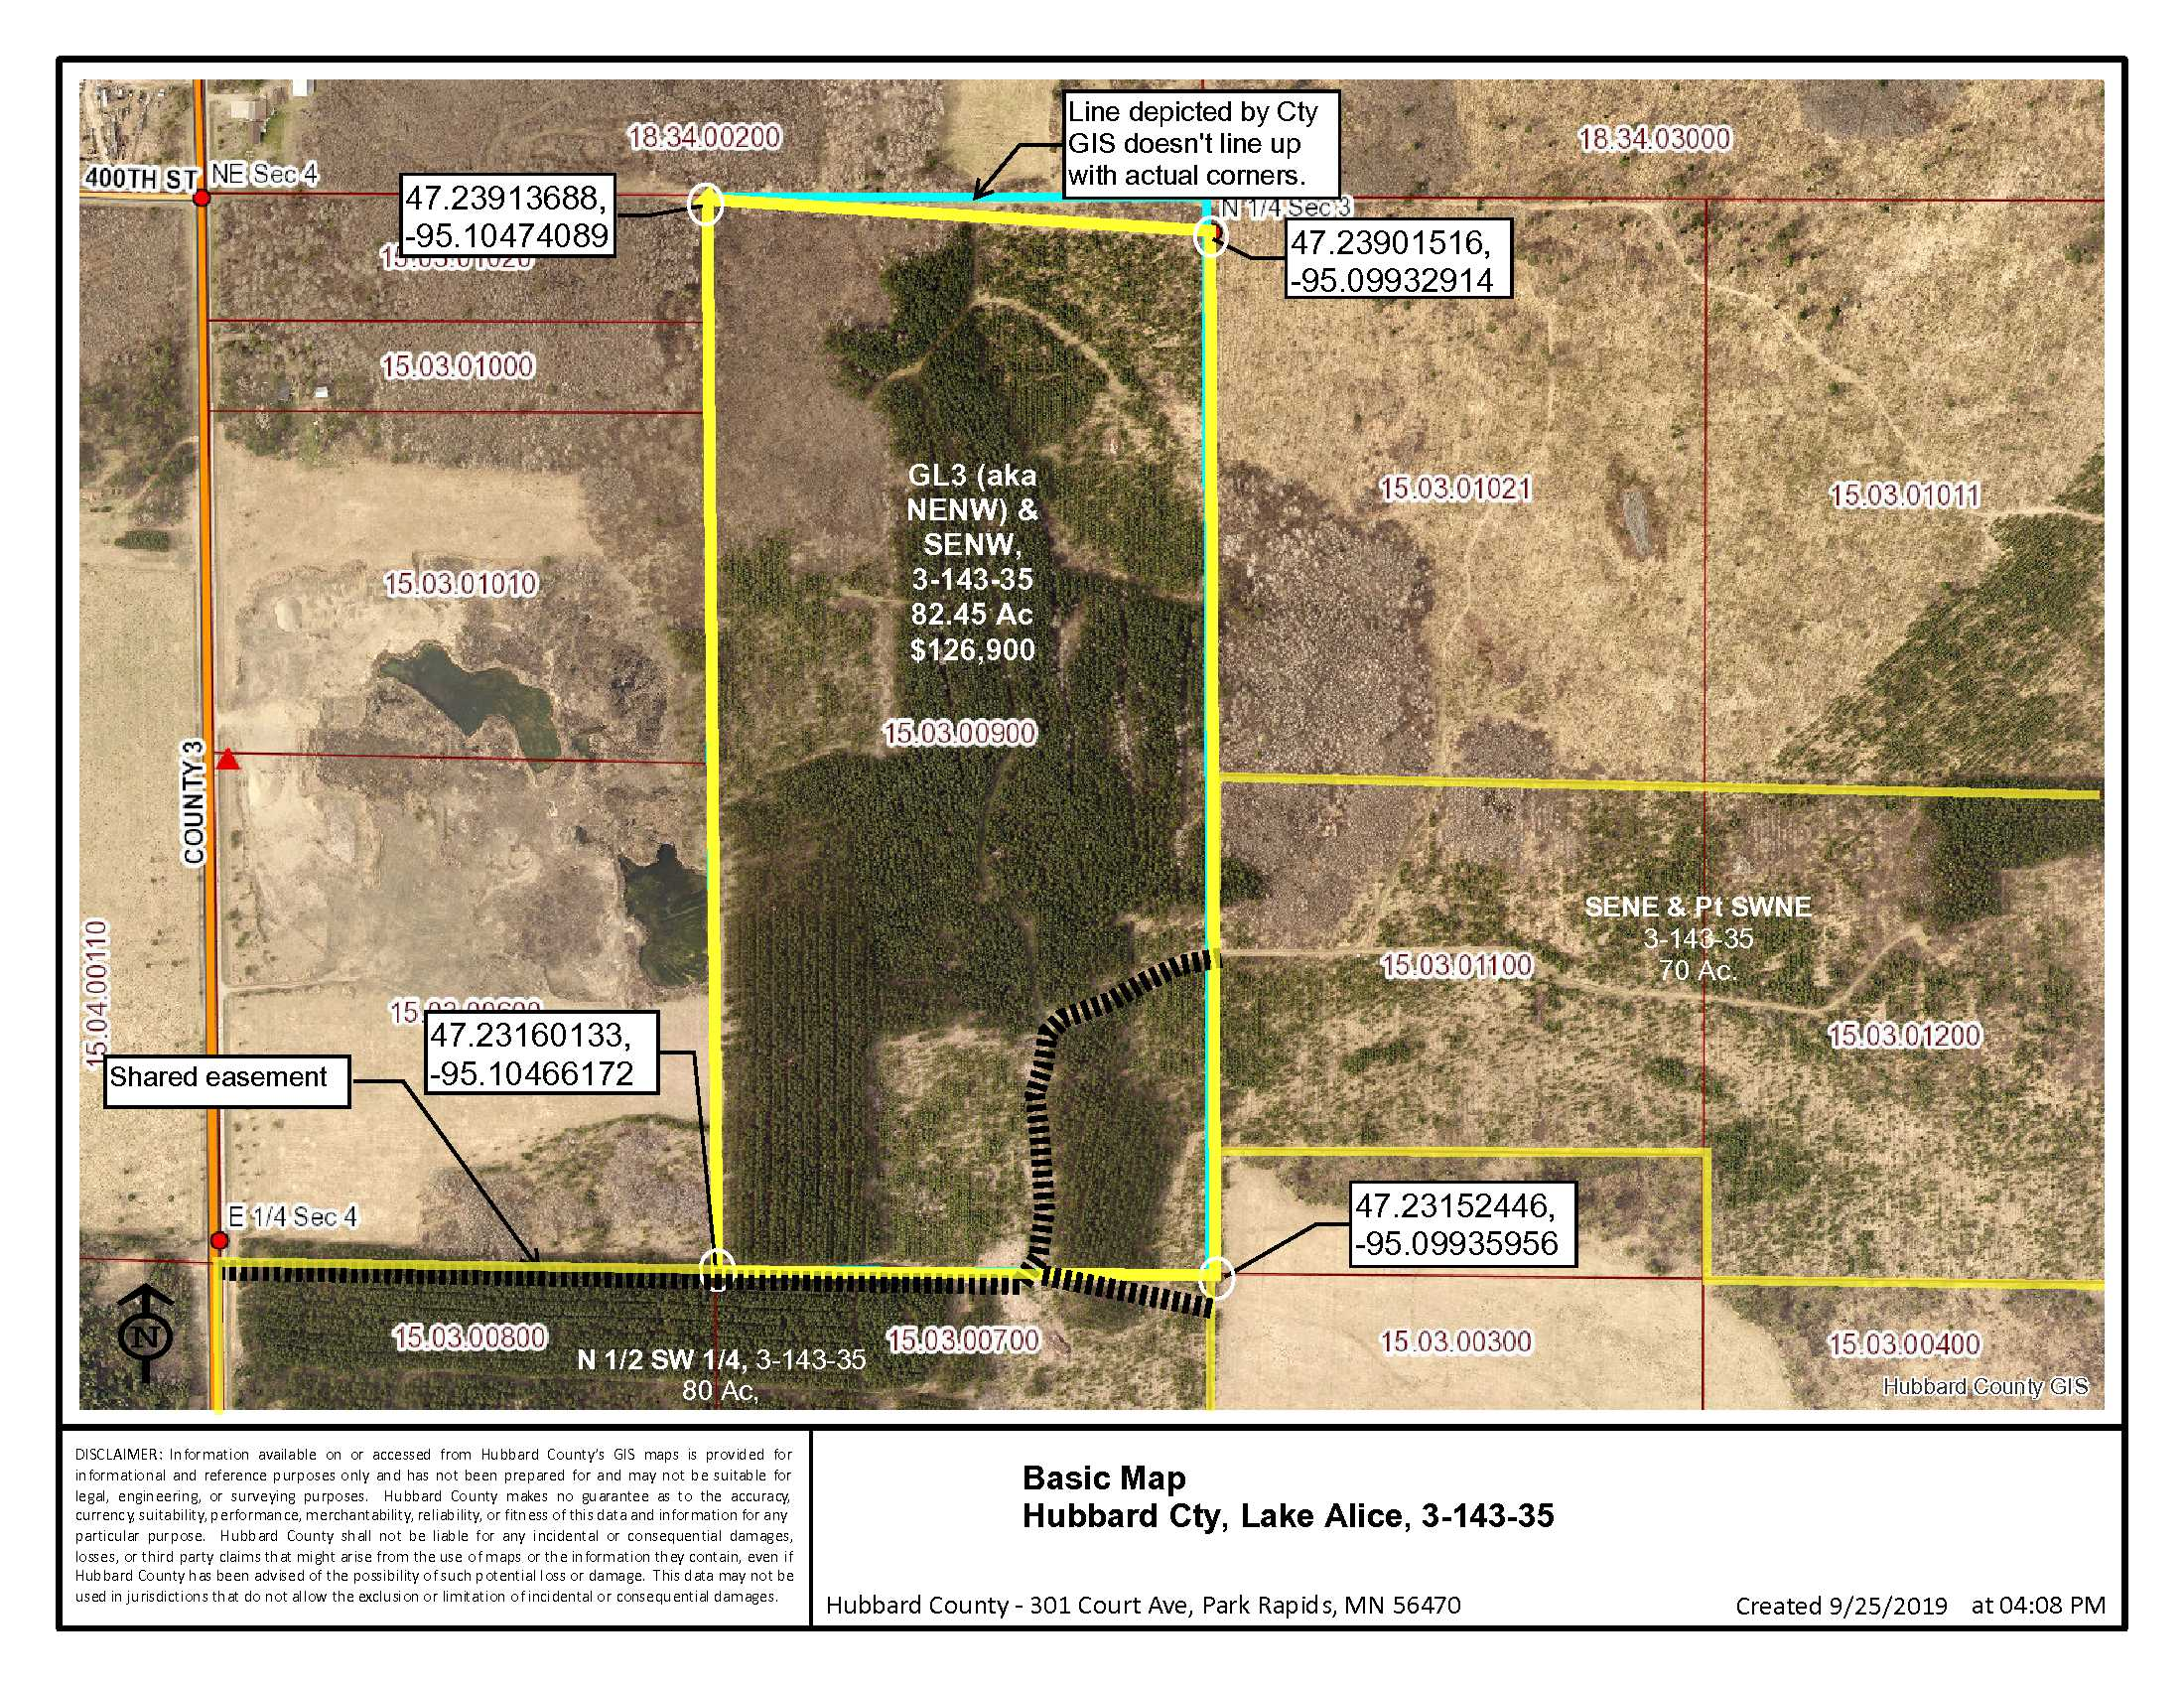 GL3(aka NENW) & SENW, Co Rd 3, Lake Alice Twp, Laporte, Hubbard Co